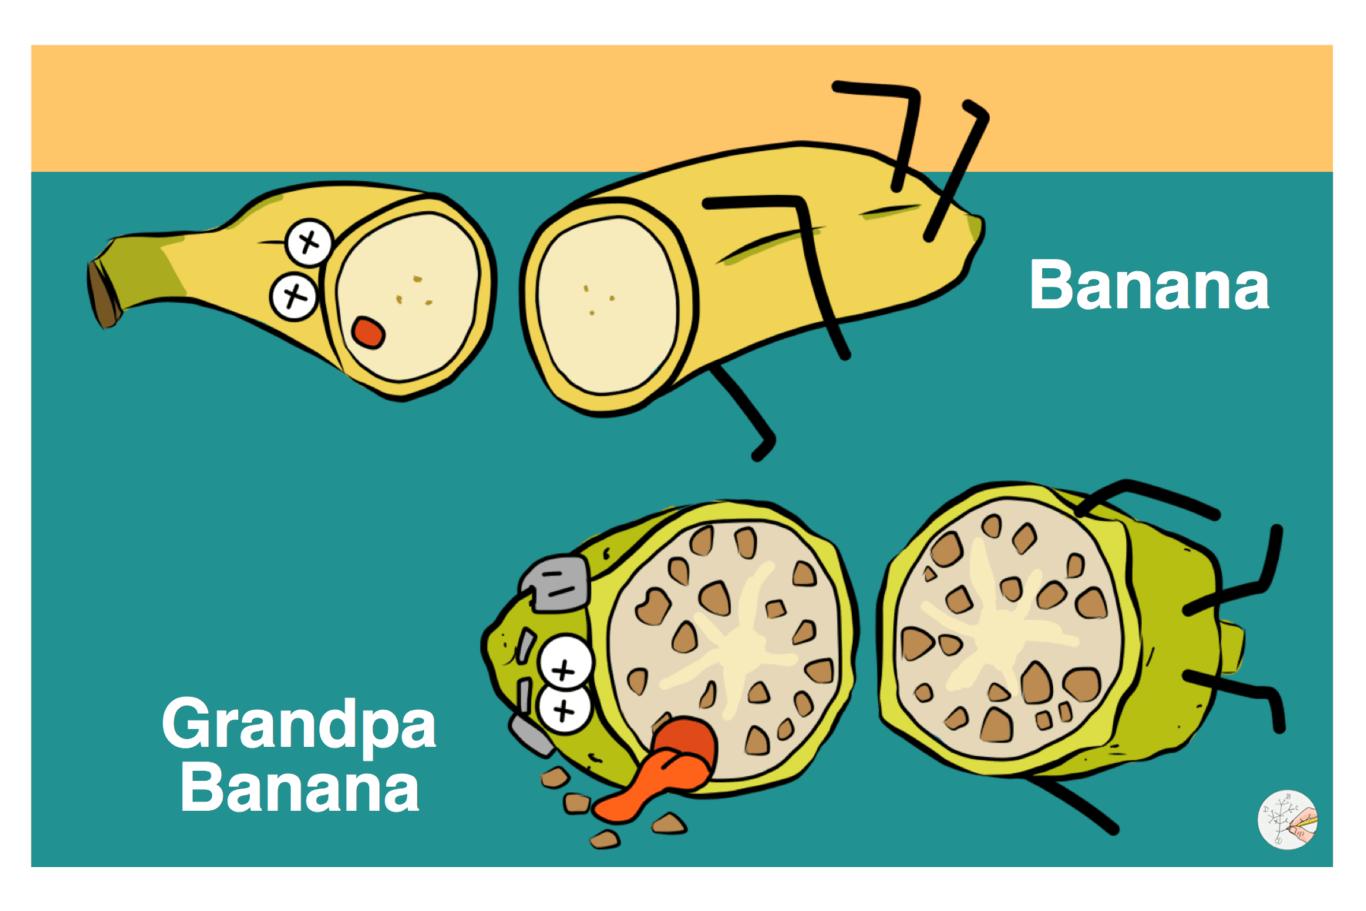 Banana grandpa